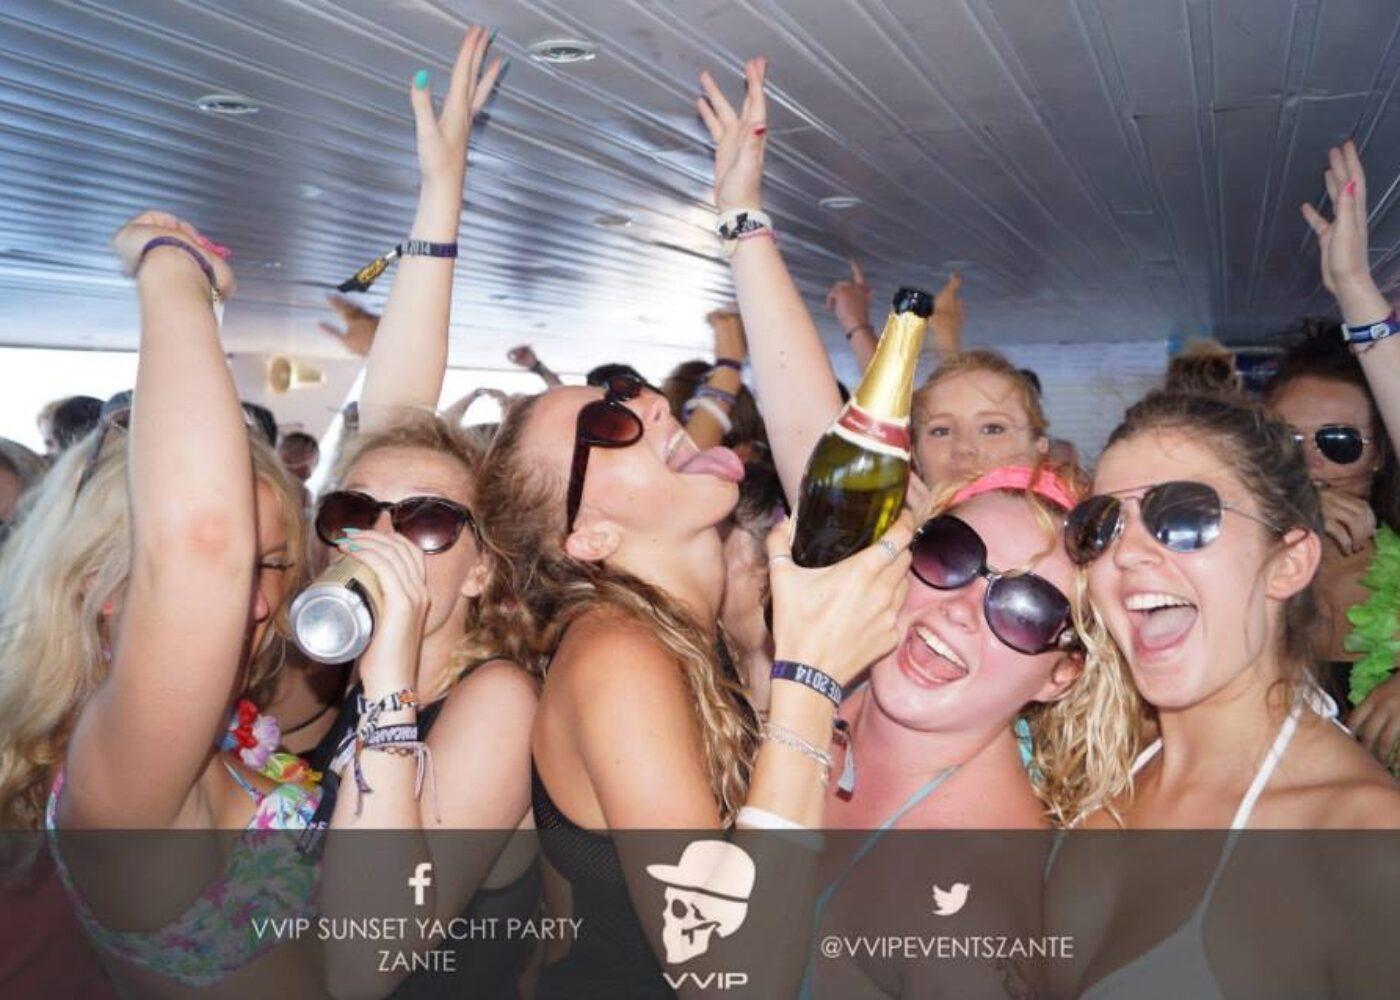 zante-boat-party-photos